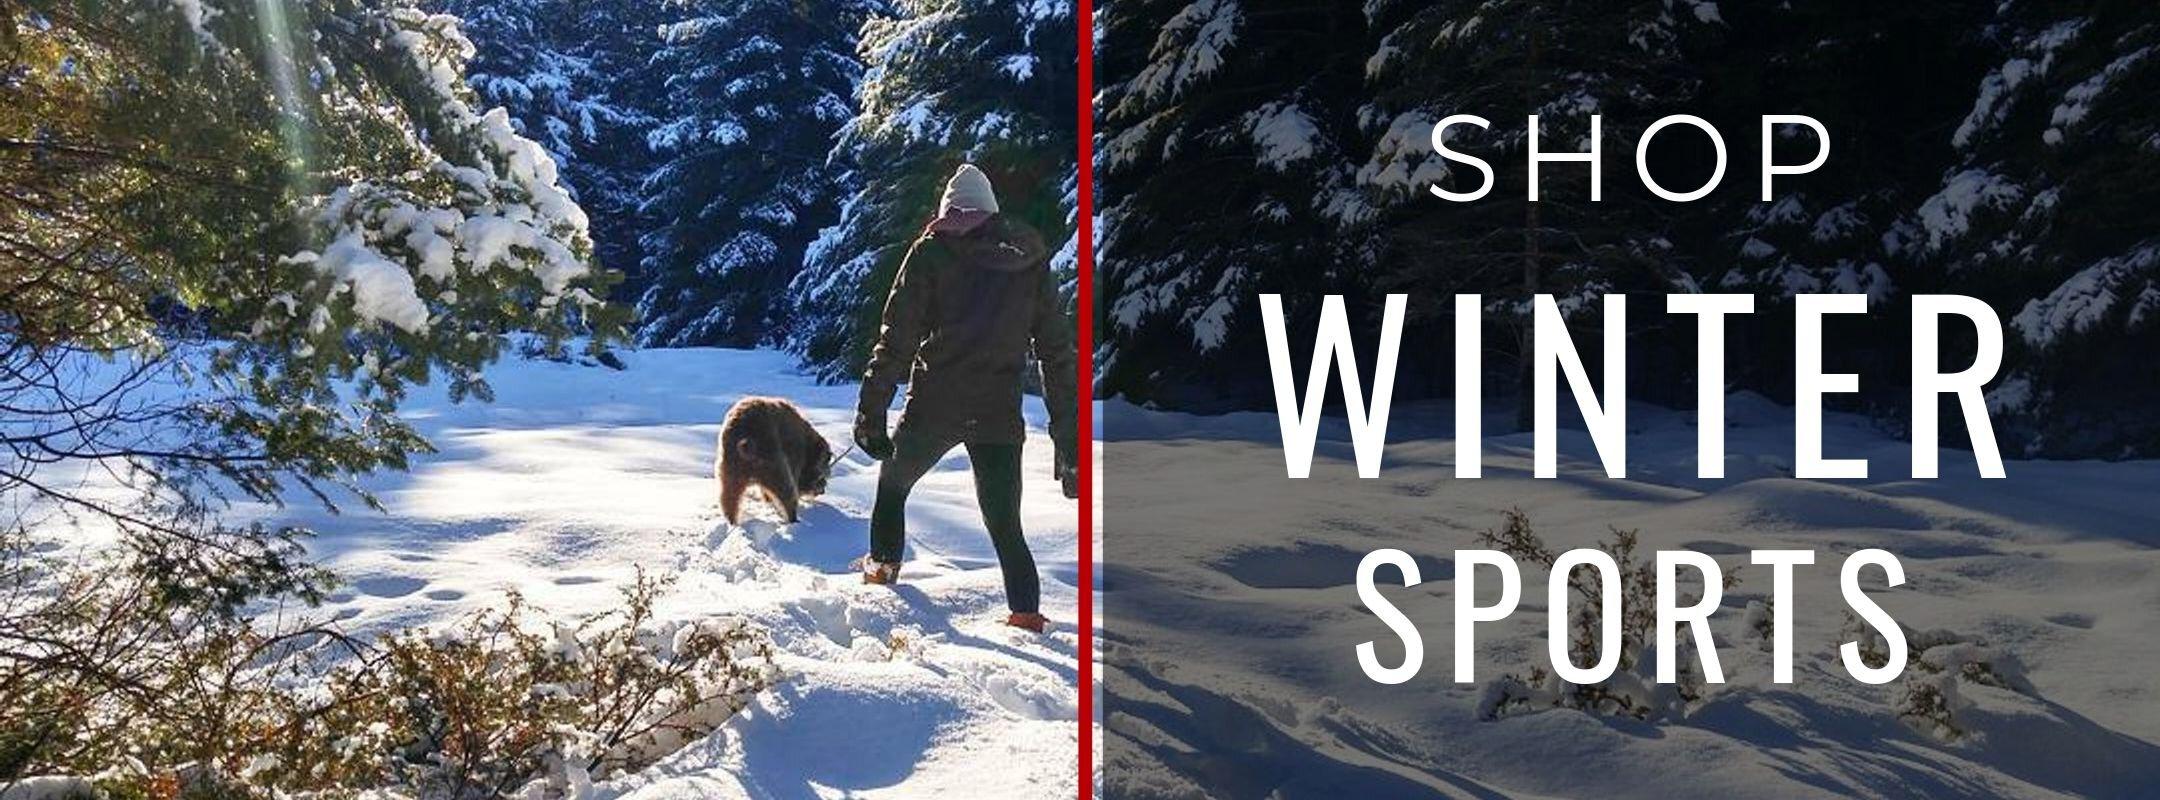 SHOP WINTER SPORTS